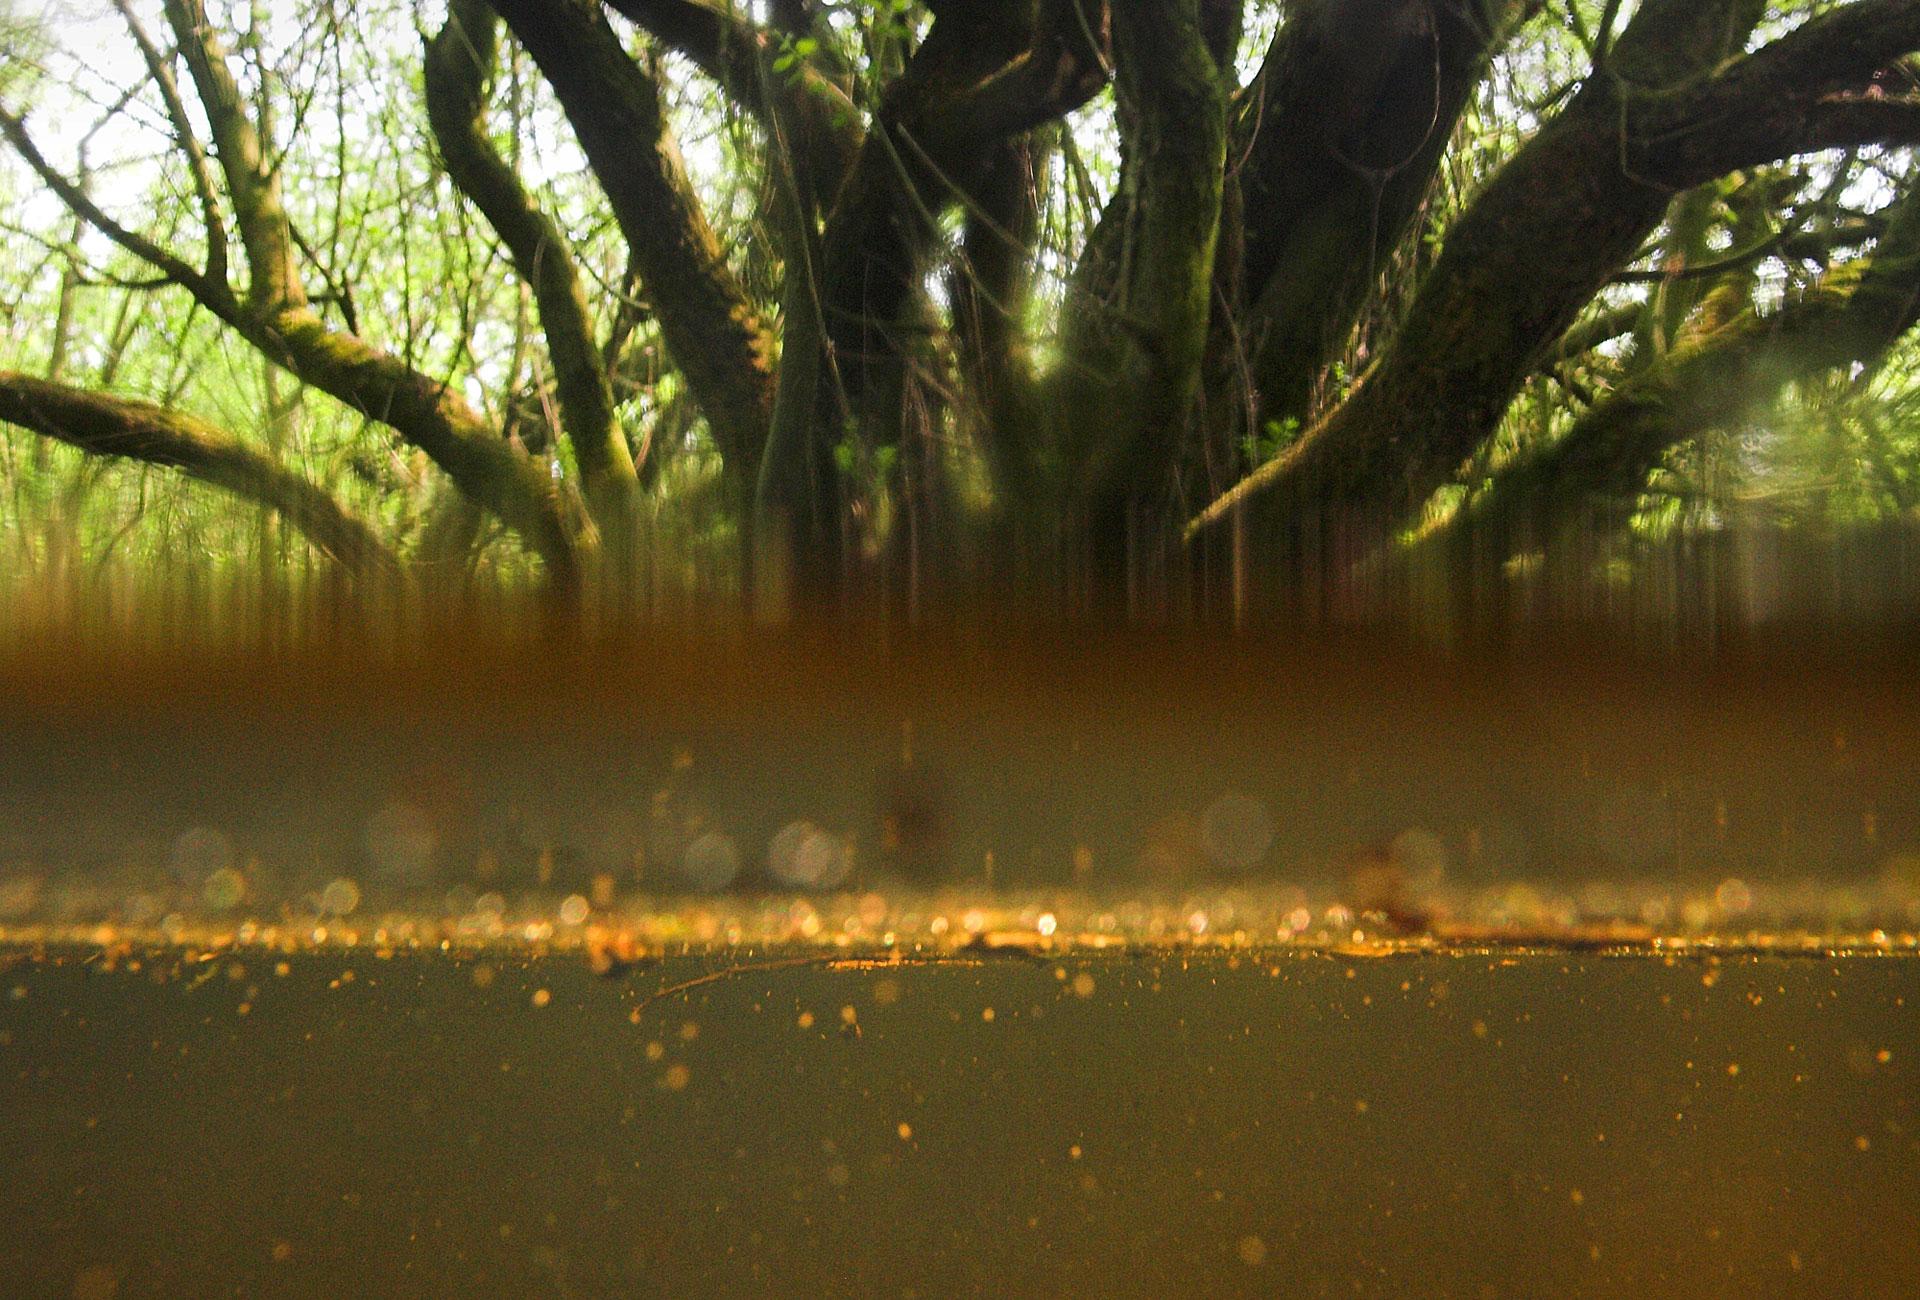 Dode Bomen Wageningen - Levende Rivier